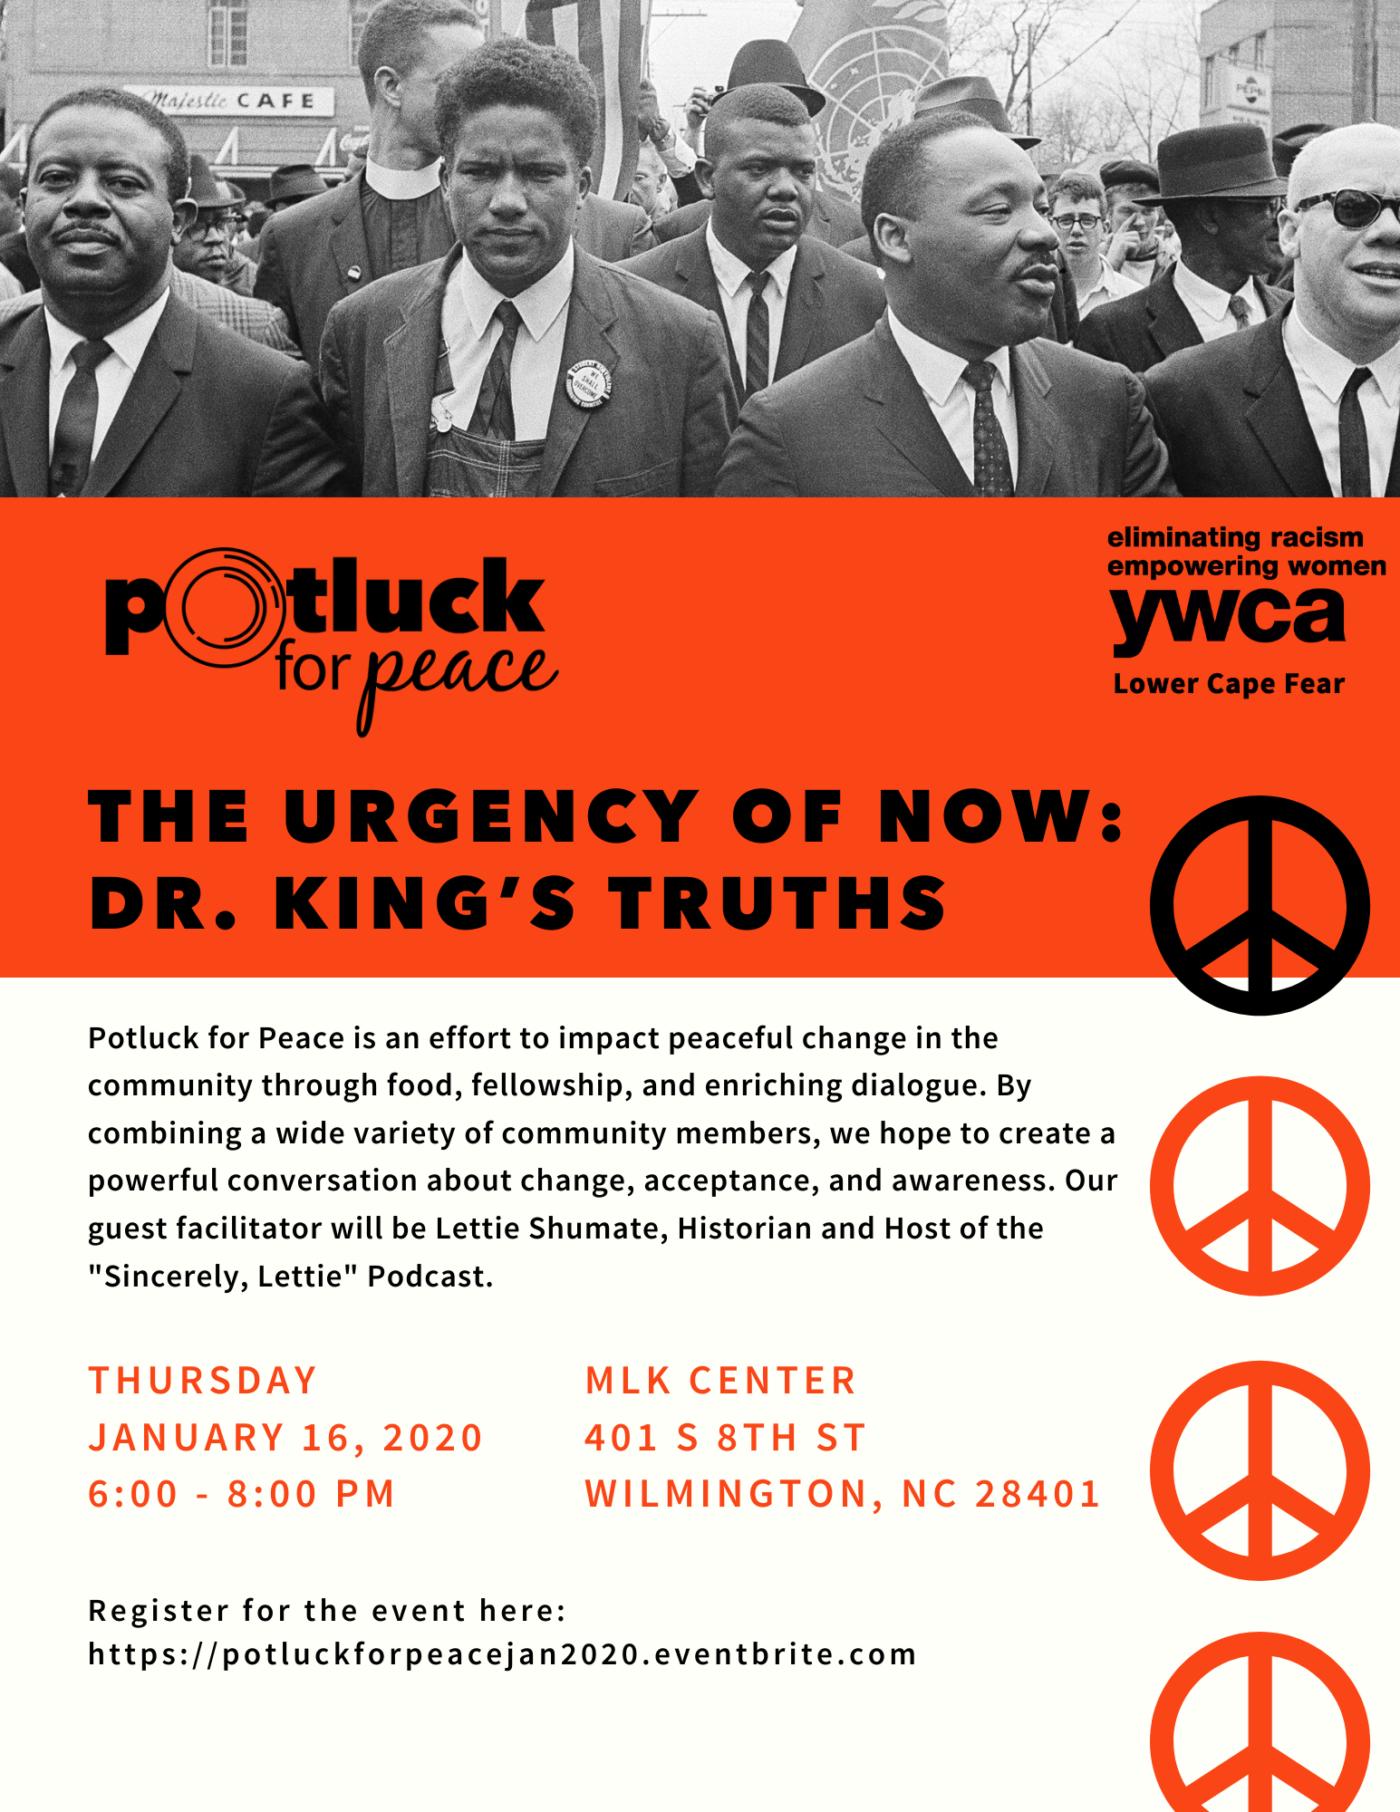 MLK Potluck for Peace